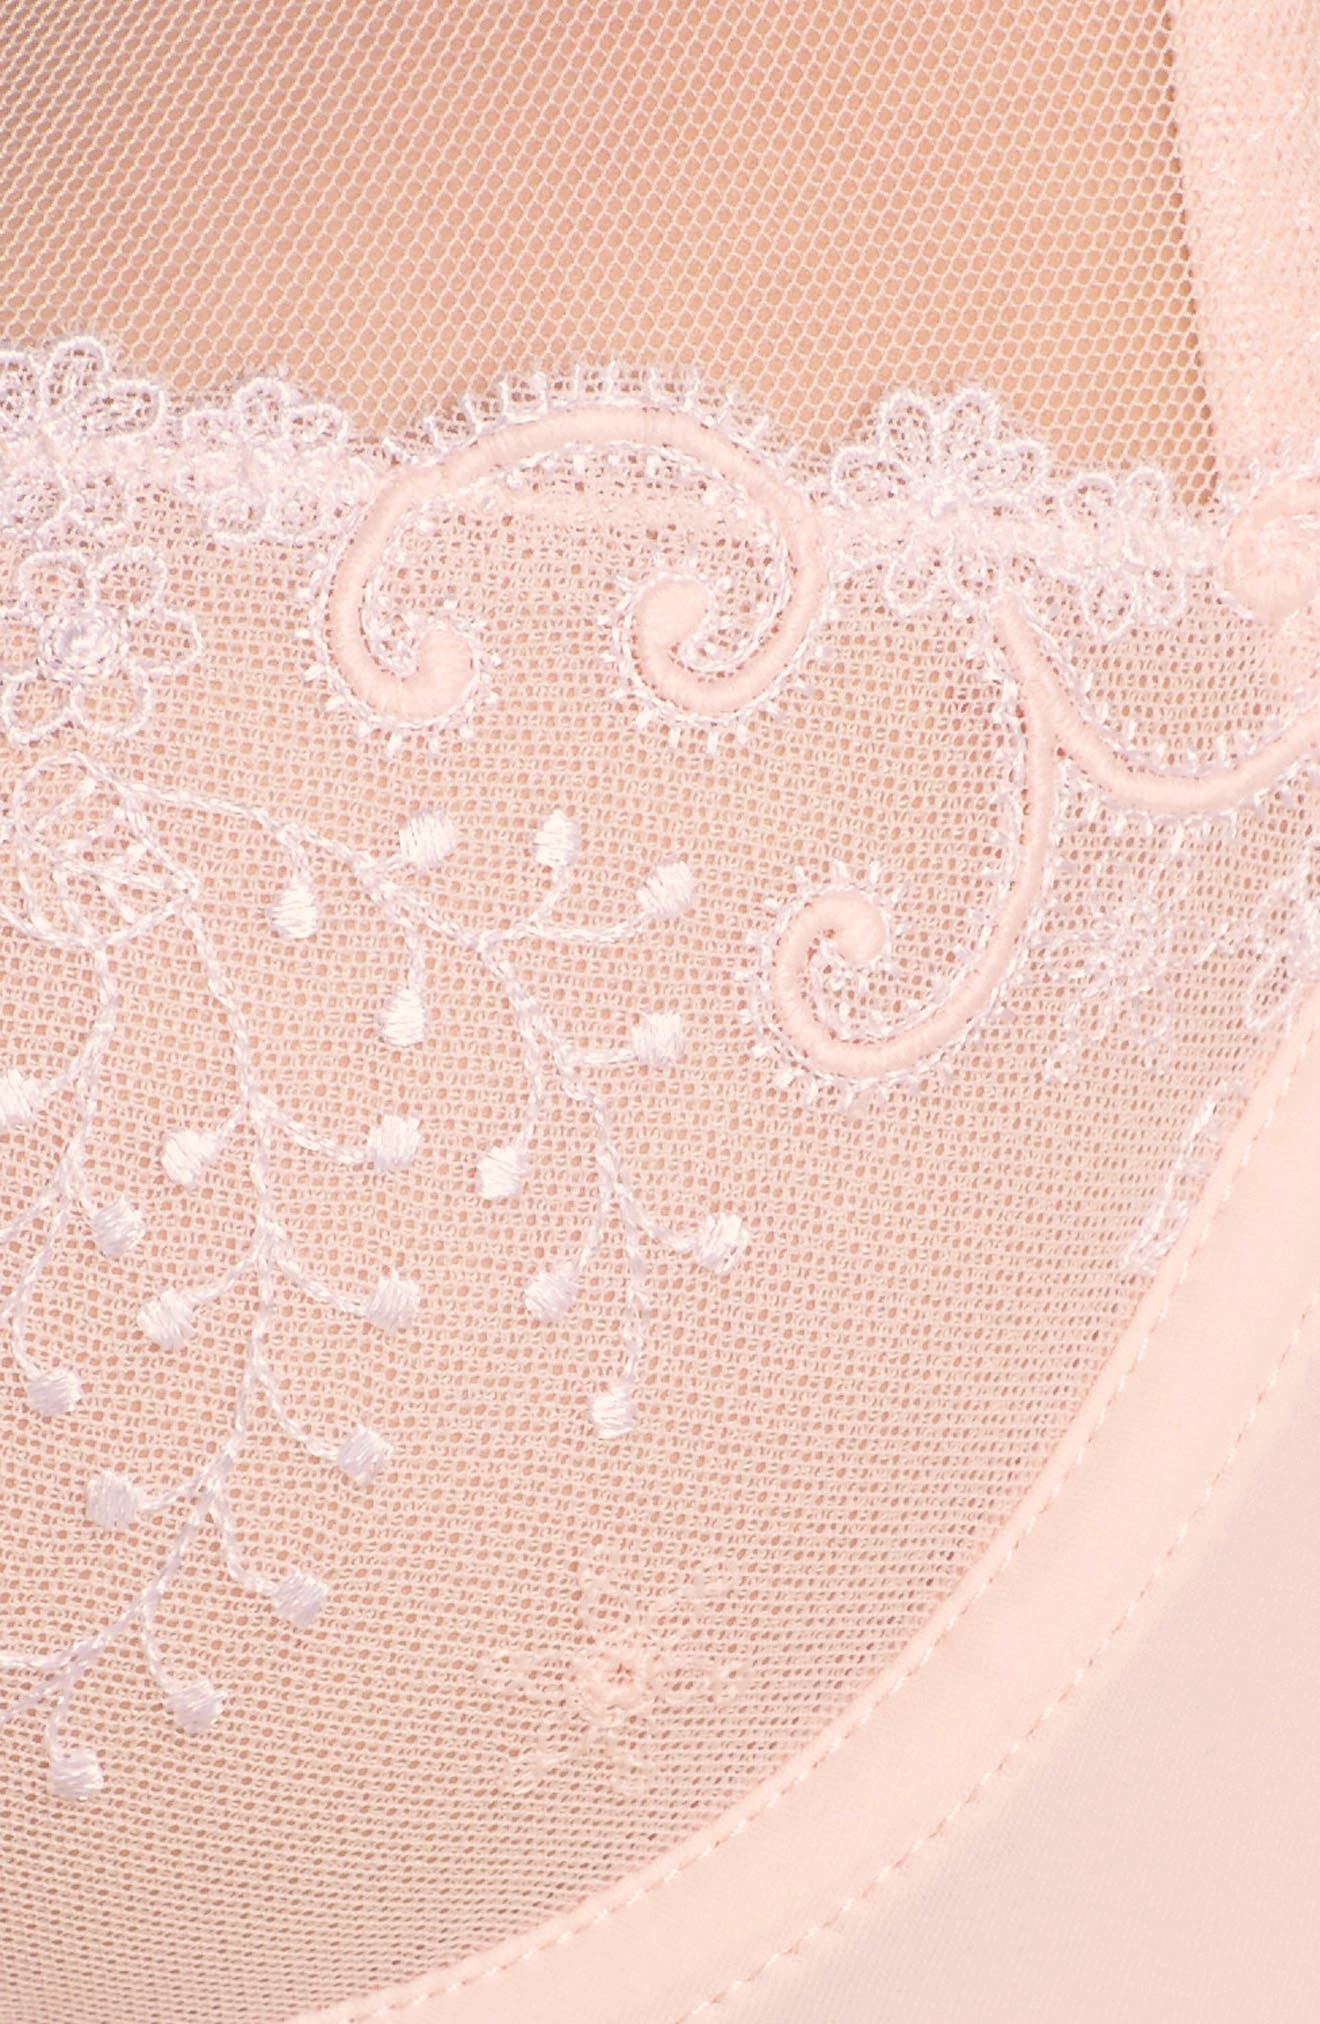 Delice Sheer Underwire Plunge Bra,                             Alternate thumbnail 10, color,                             Blush